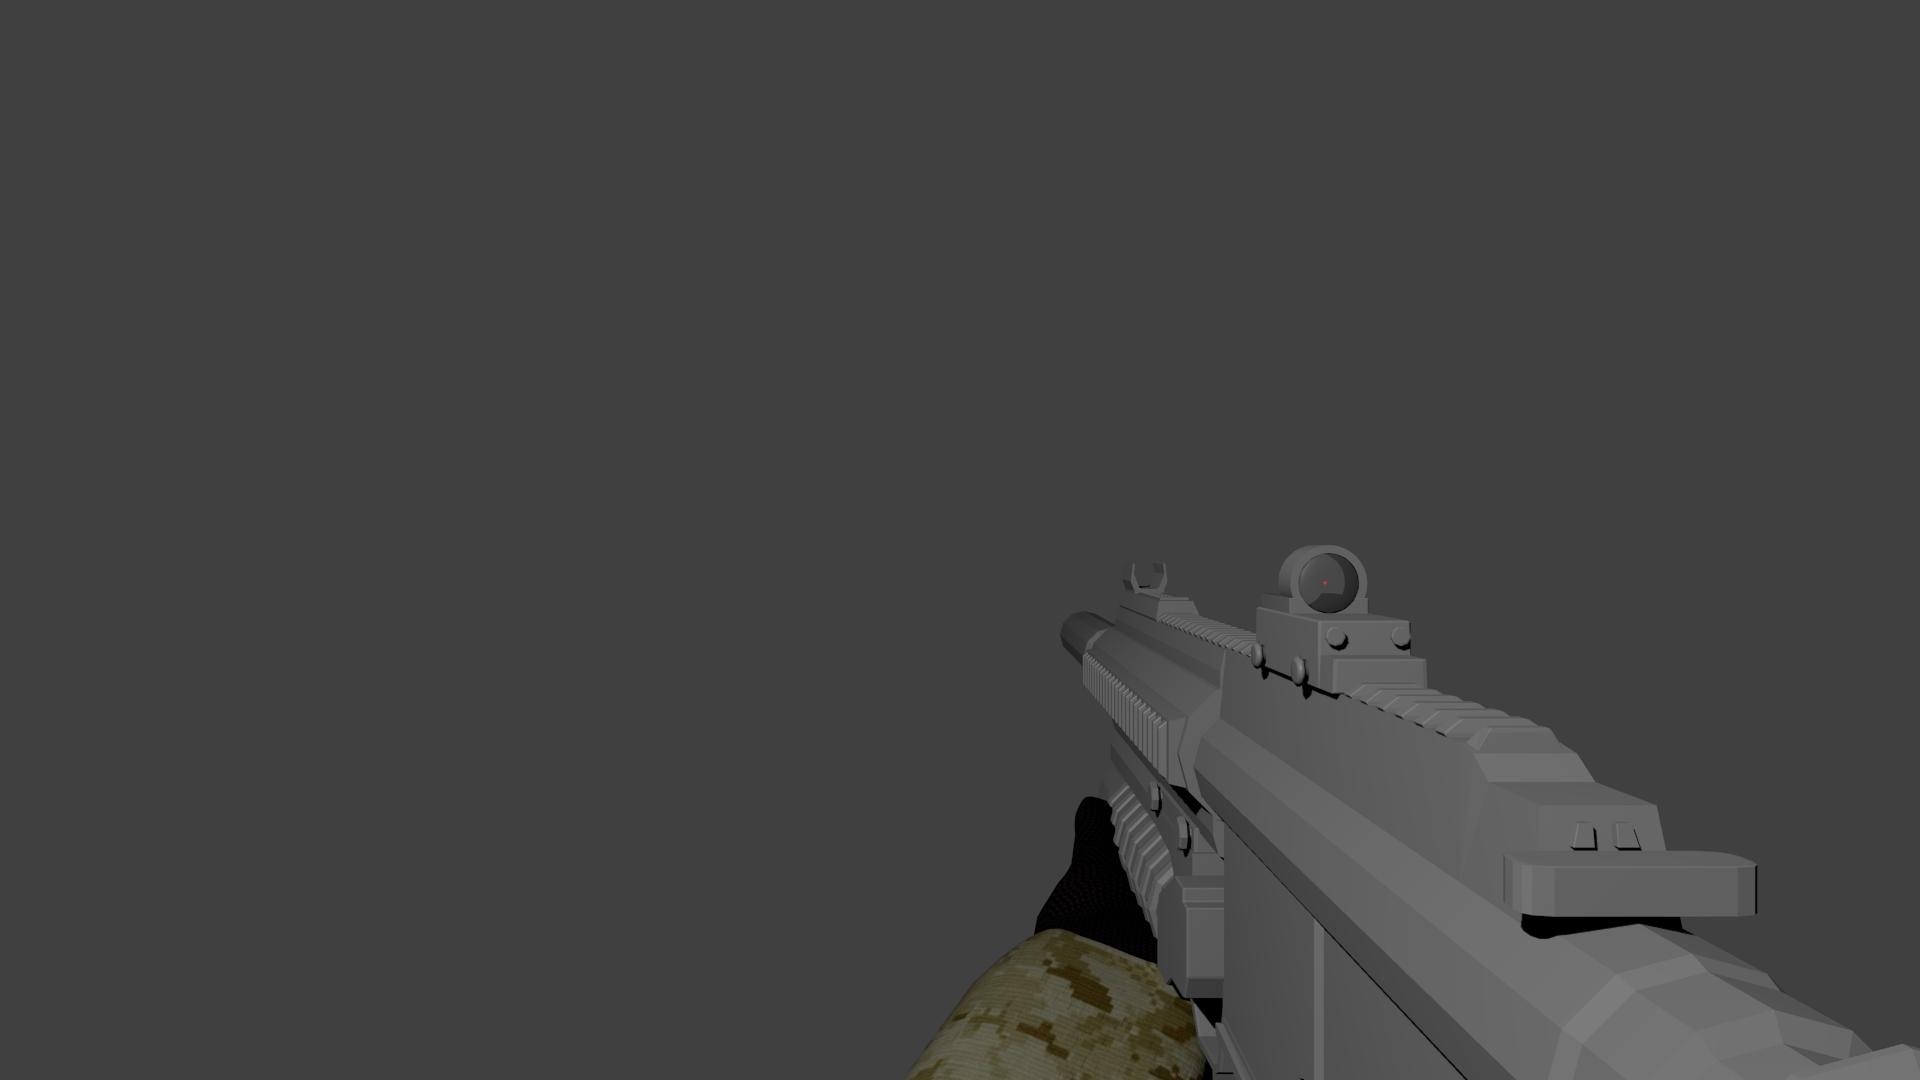 3d m416 preview render by superman999 on deviantart - M416 wallpaper ...